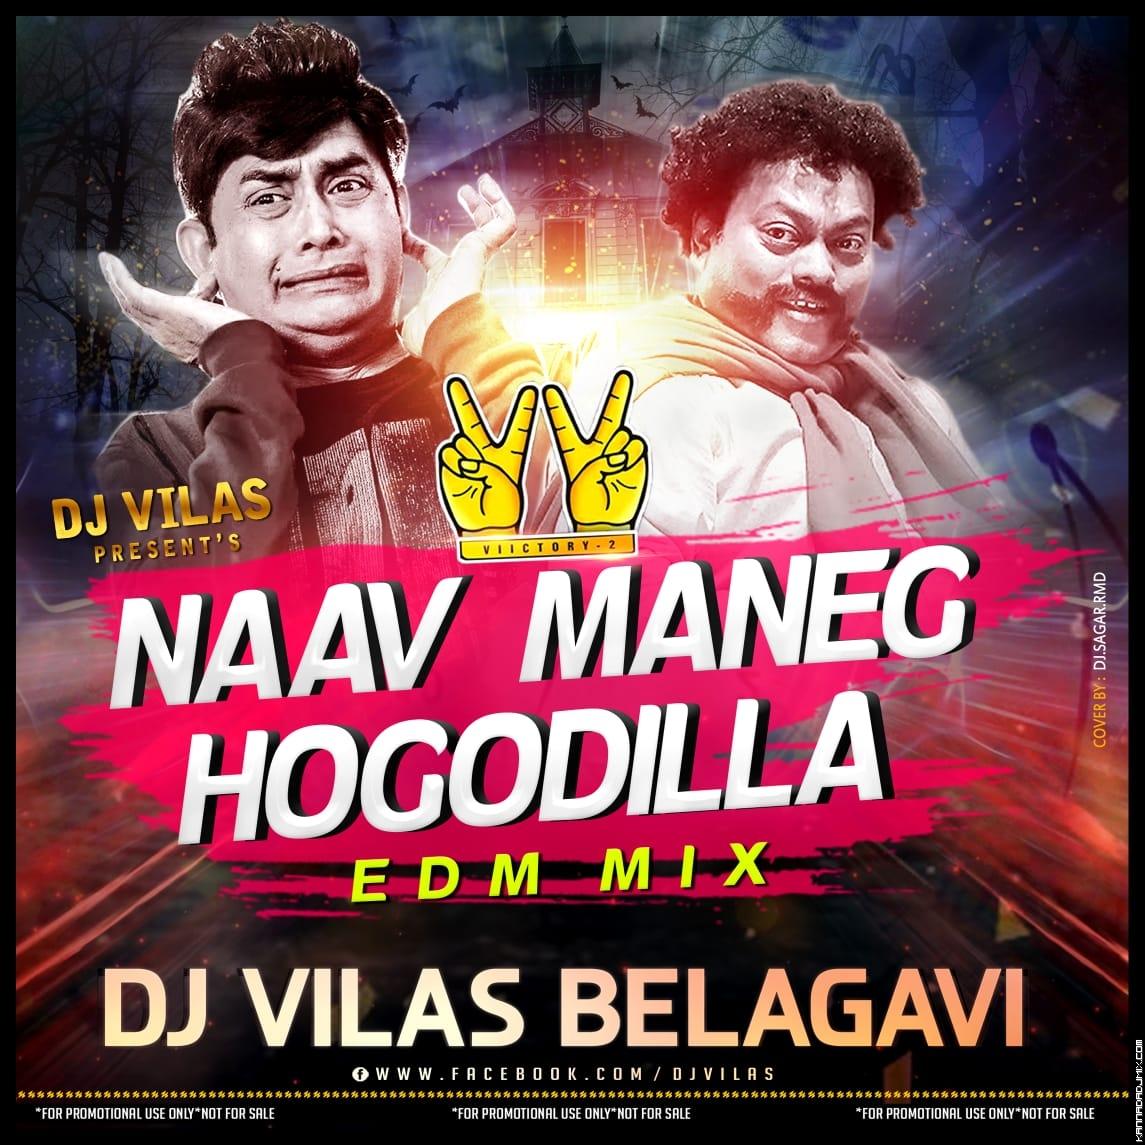 NAAV MANEGE HOGODILLA  EDM MIX DJ VILAS BGM.mp3